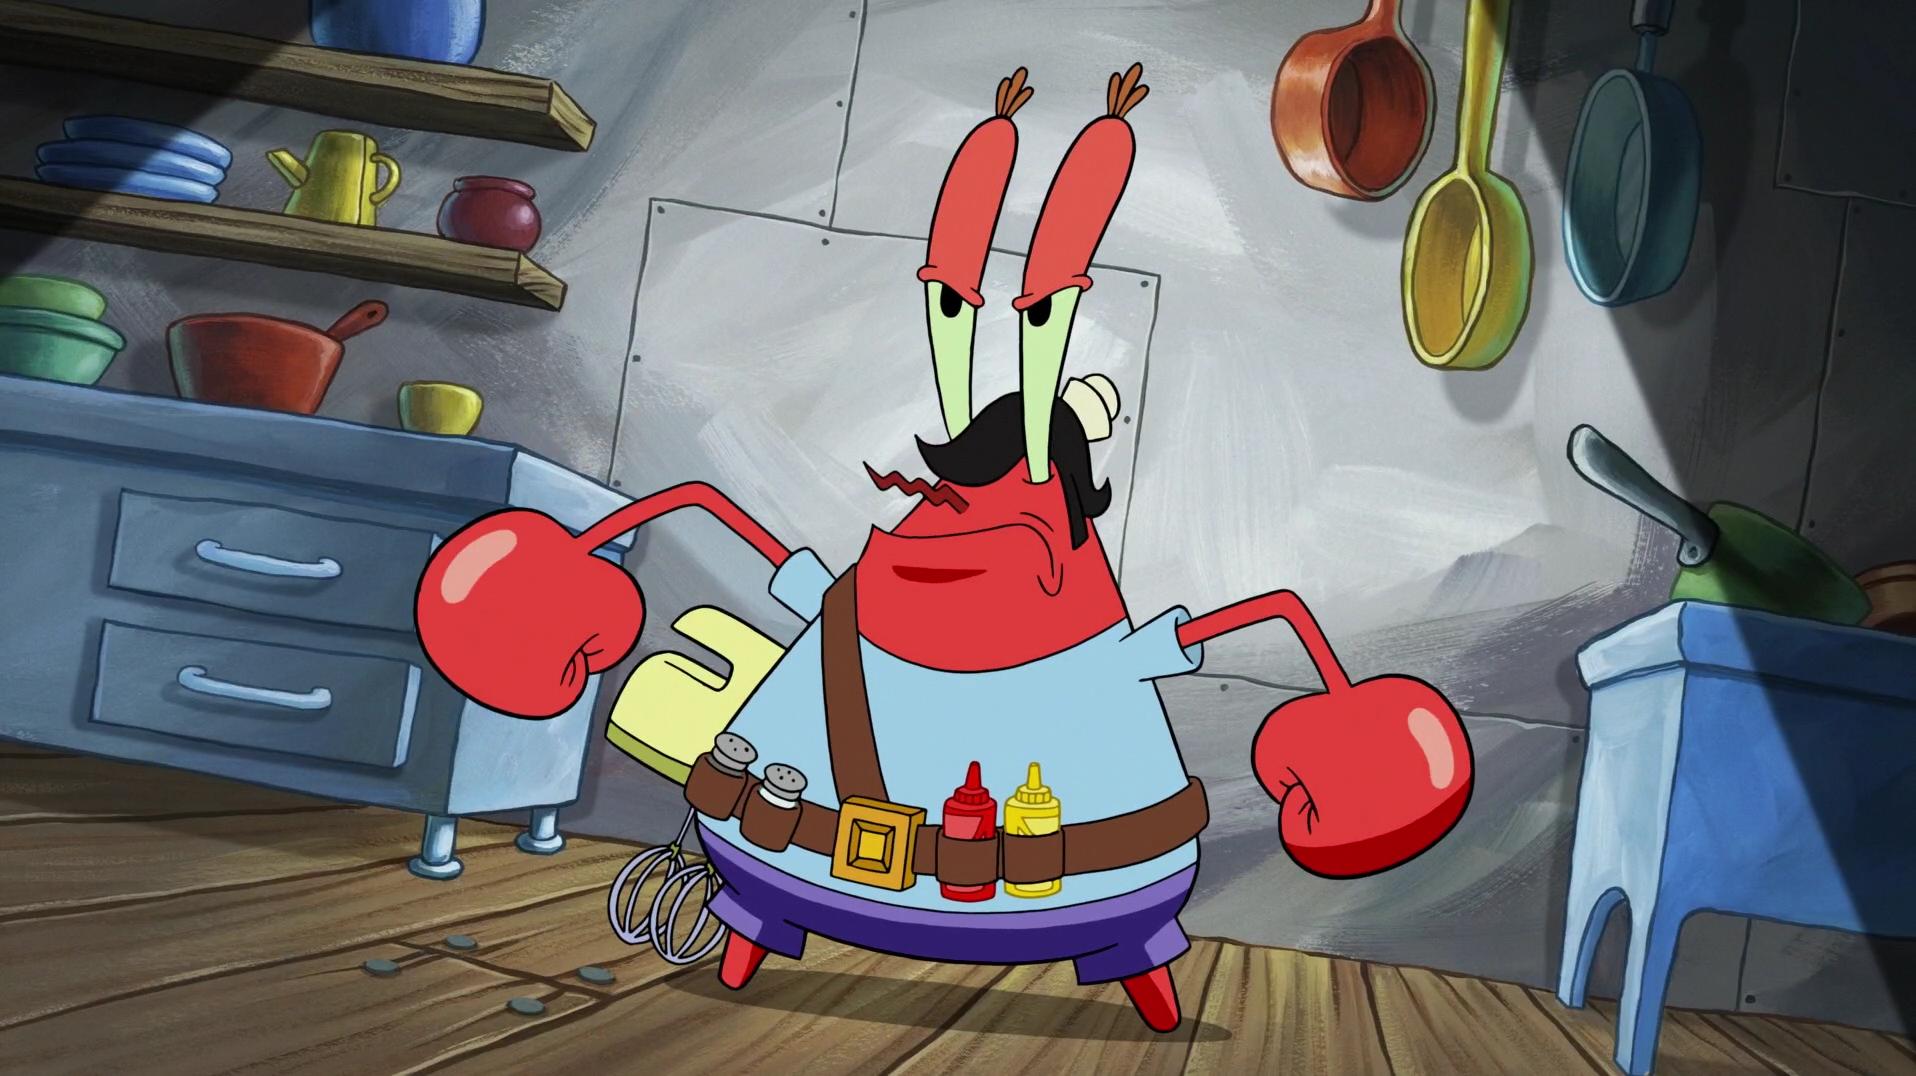 spongebuddy mania spongebob episode pull up a barrel